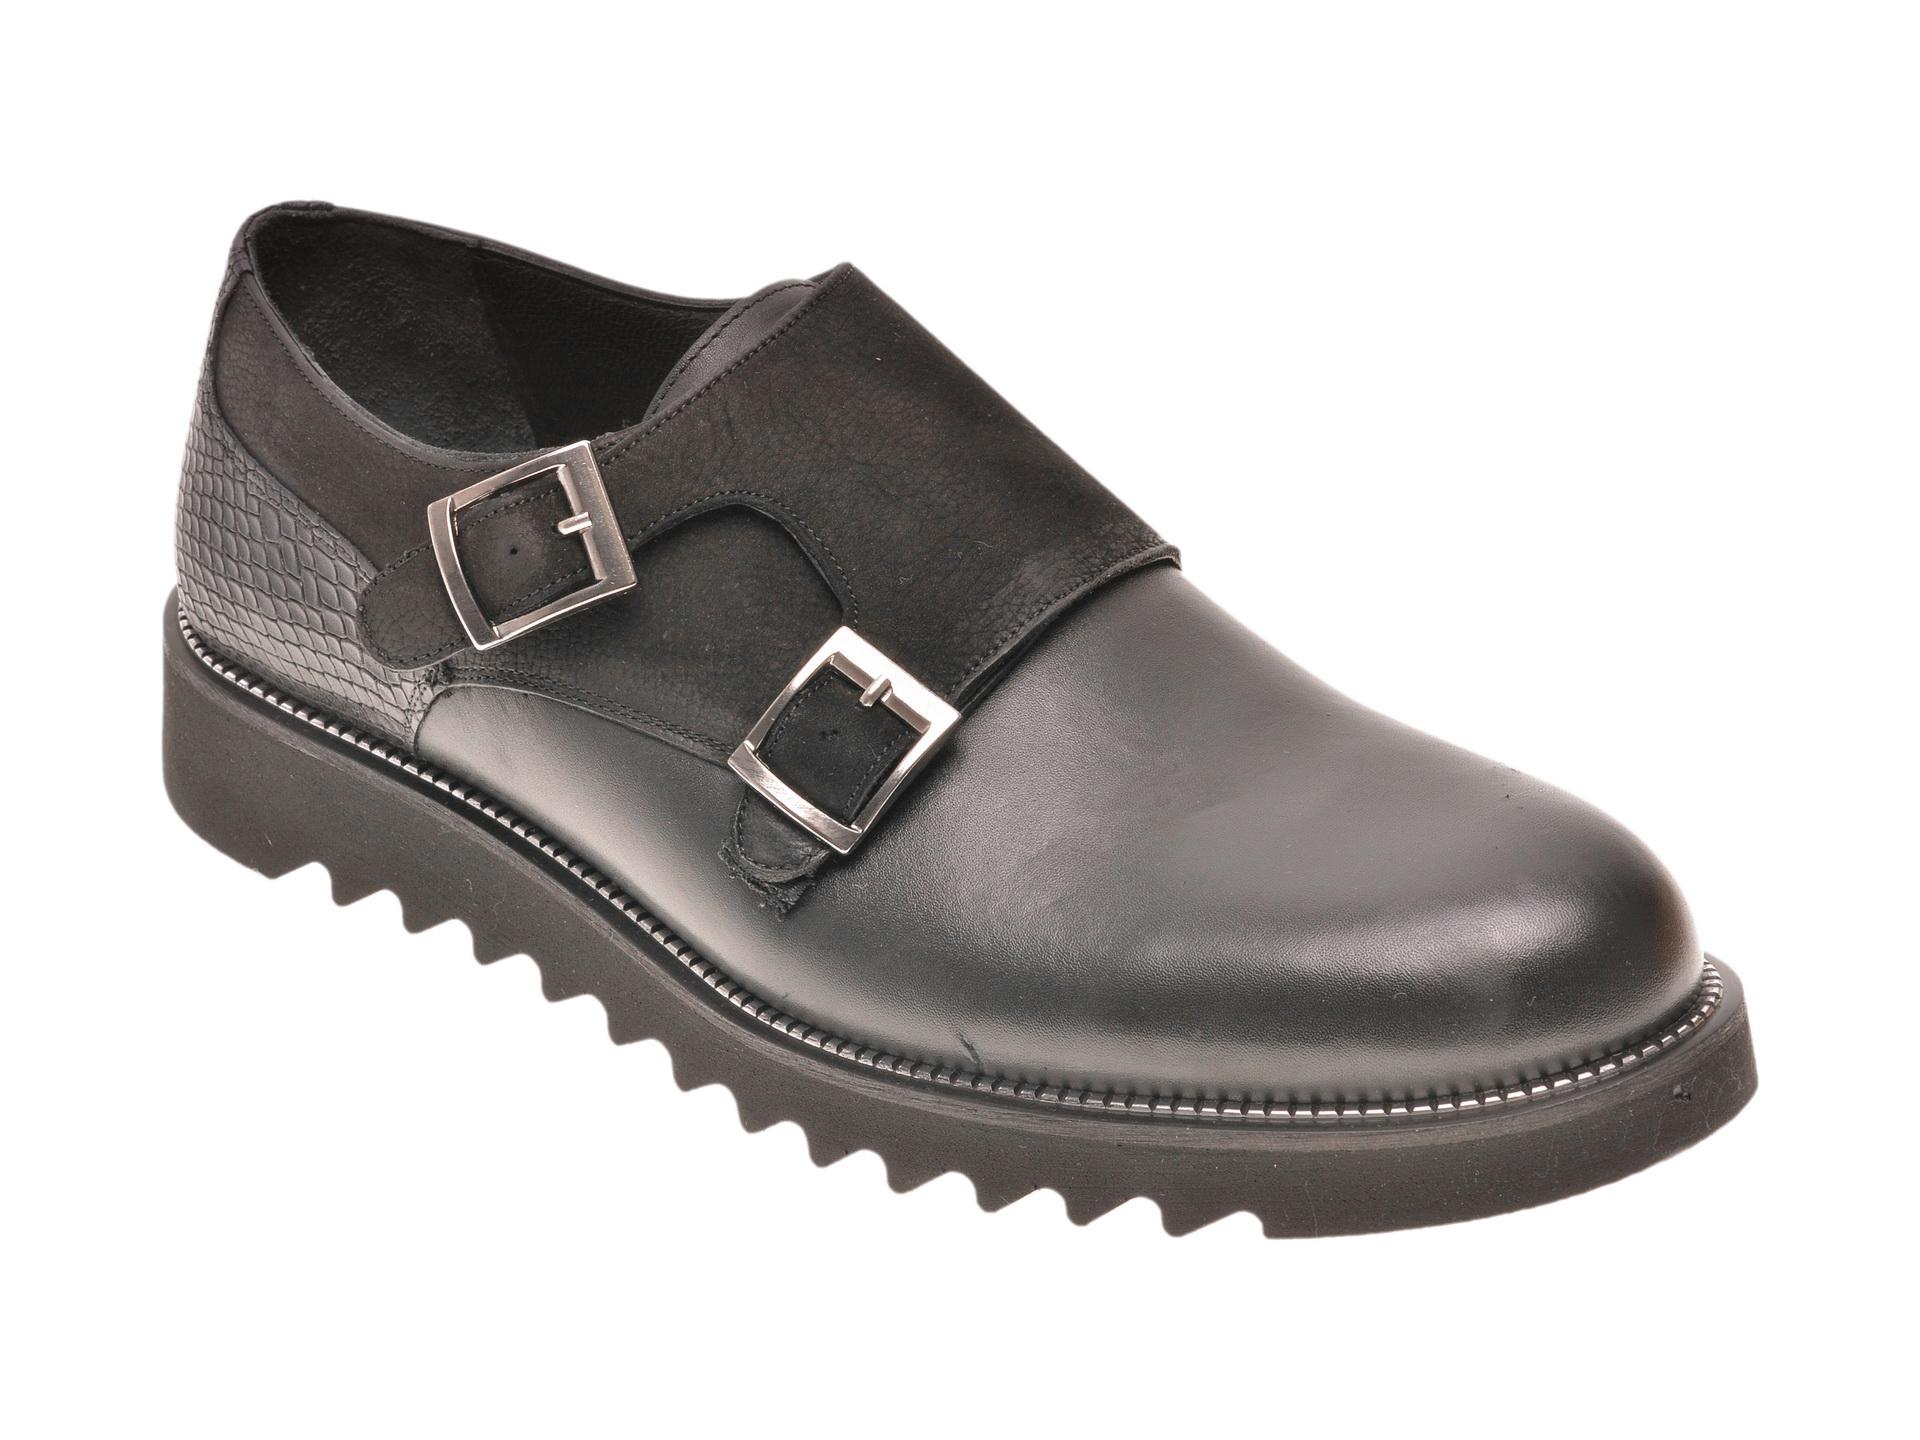 Pantofi Otter Negri, 5981, Din Piele Naturala